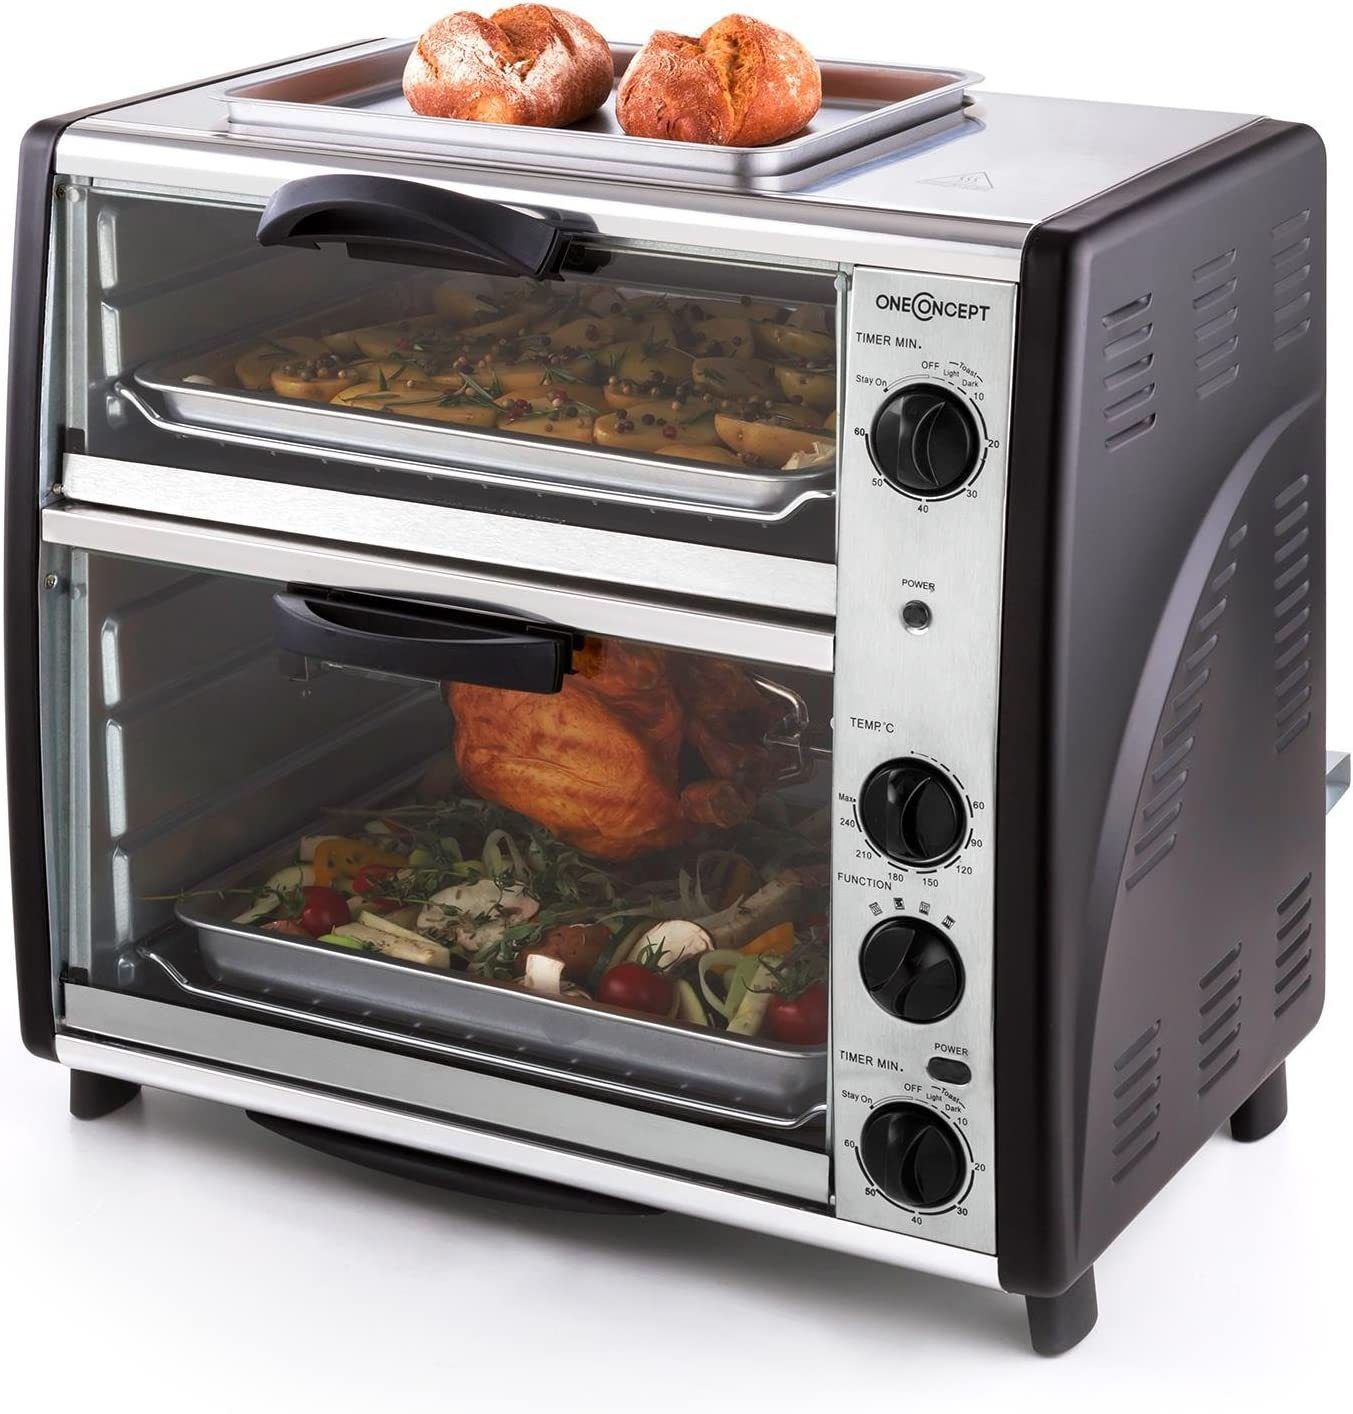 oneConcept All-You-Can-Eat Horno eléctrico doble - 2 cámaras de cocción, Parrilla superior, Capacidad Total 42 L, 2400 W, Temperatura: 60-240°C, Temporizador, Acero inoxidable, Plateado